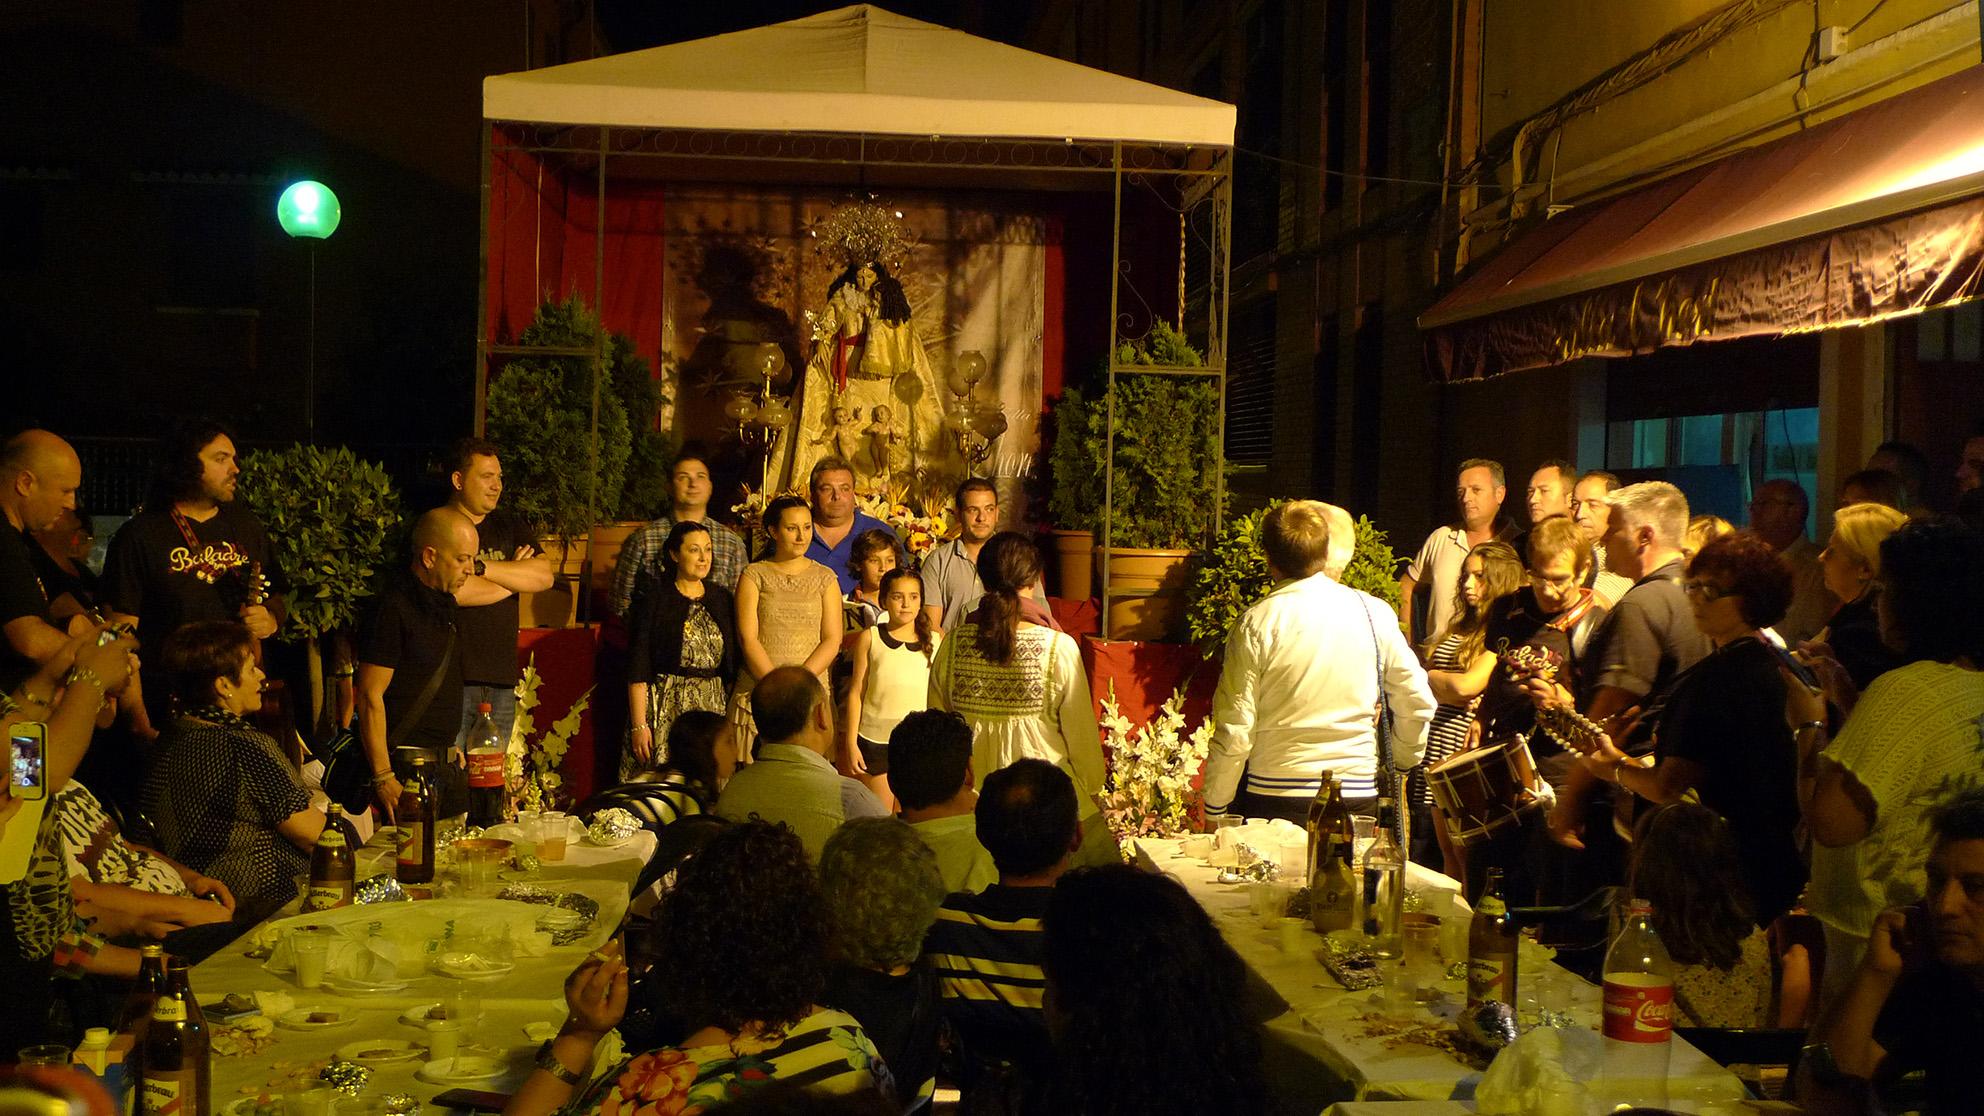 2014-06-07-Albaes d'Albal-Desemparats07 (30)